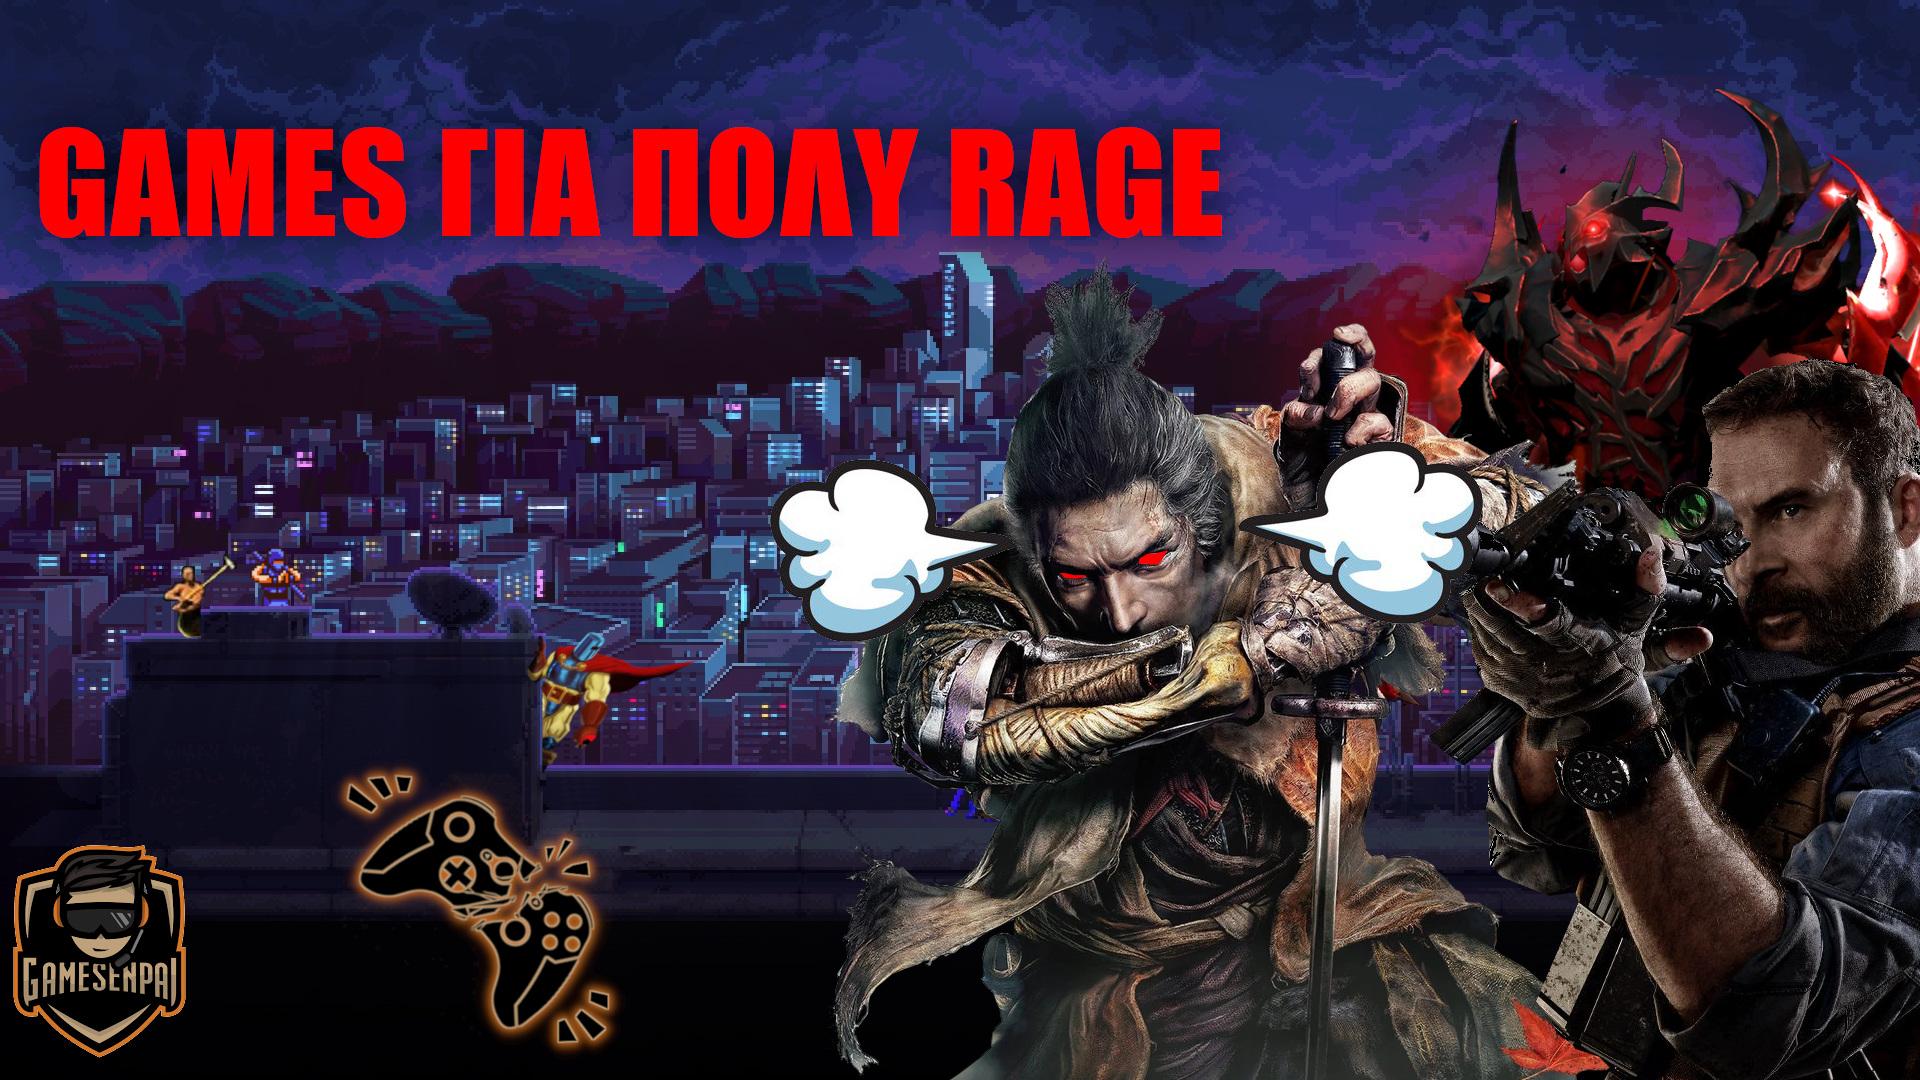 Games για πολύ Rage